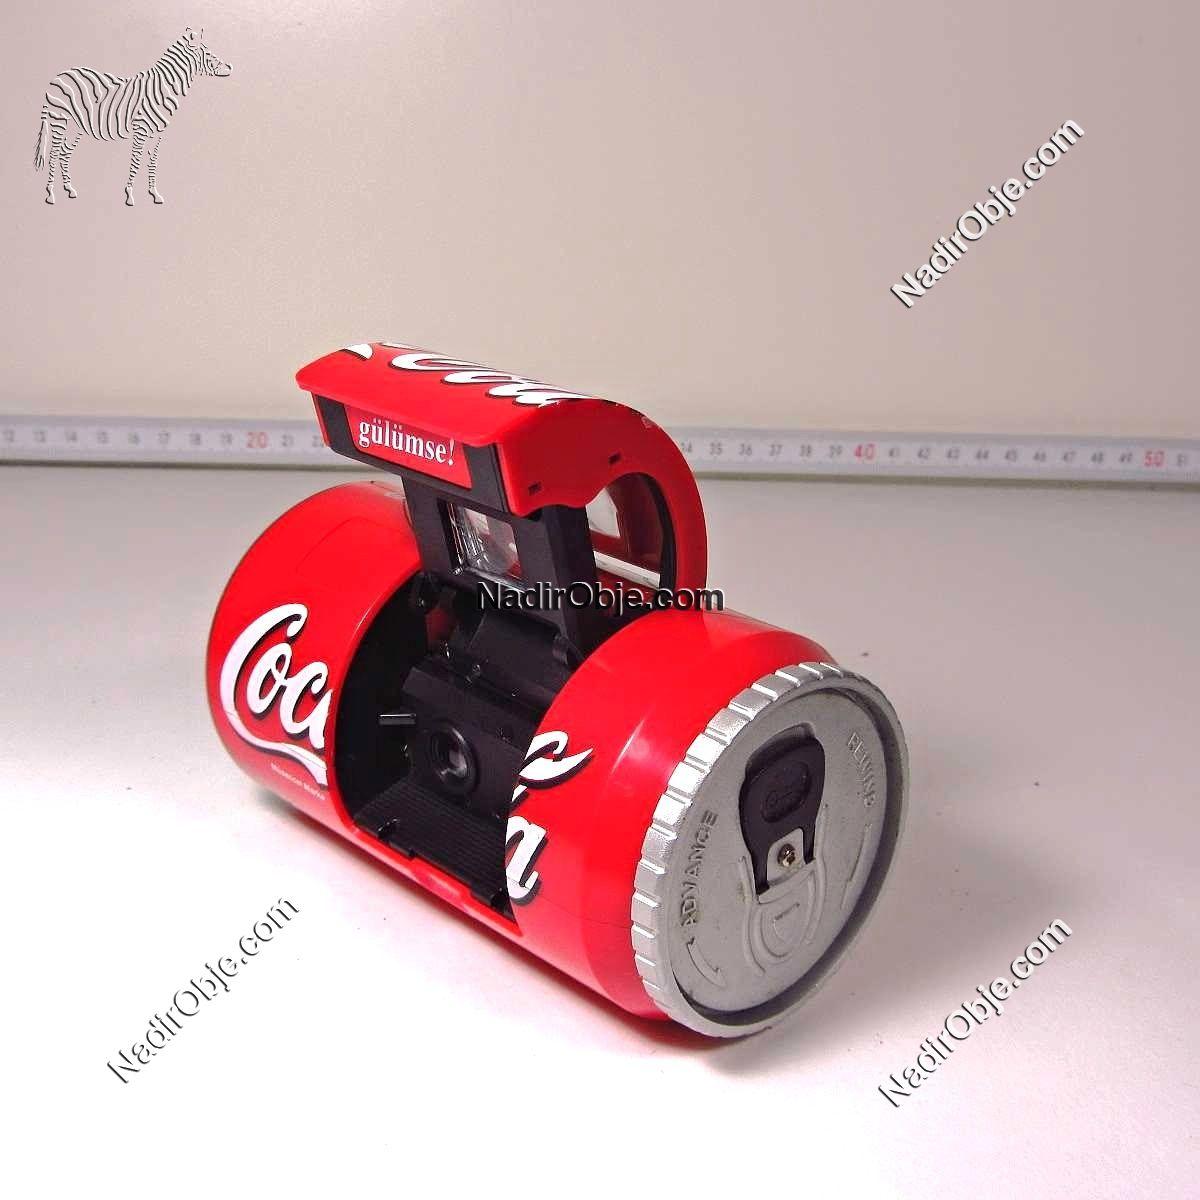 Coca Cola Fotoğraf Makinası Mekanik-Elektrikli Objeler Coca Cola